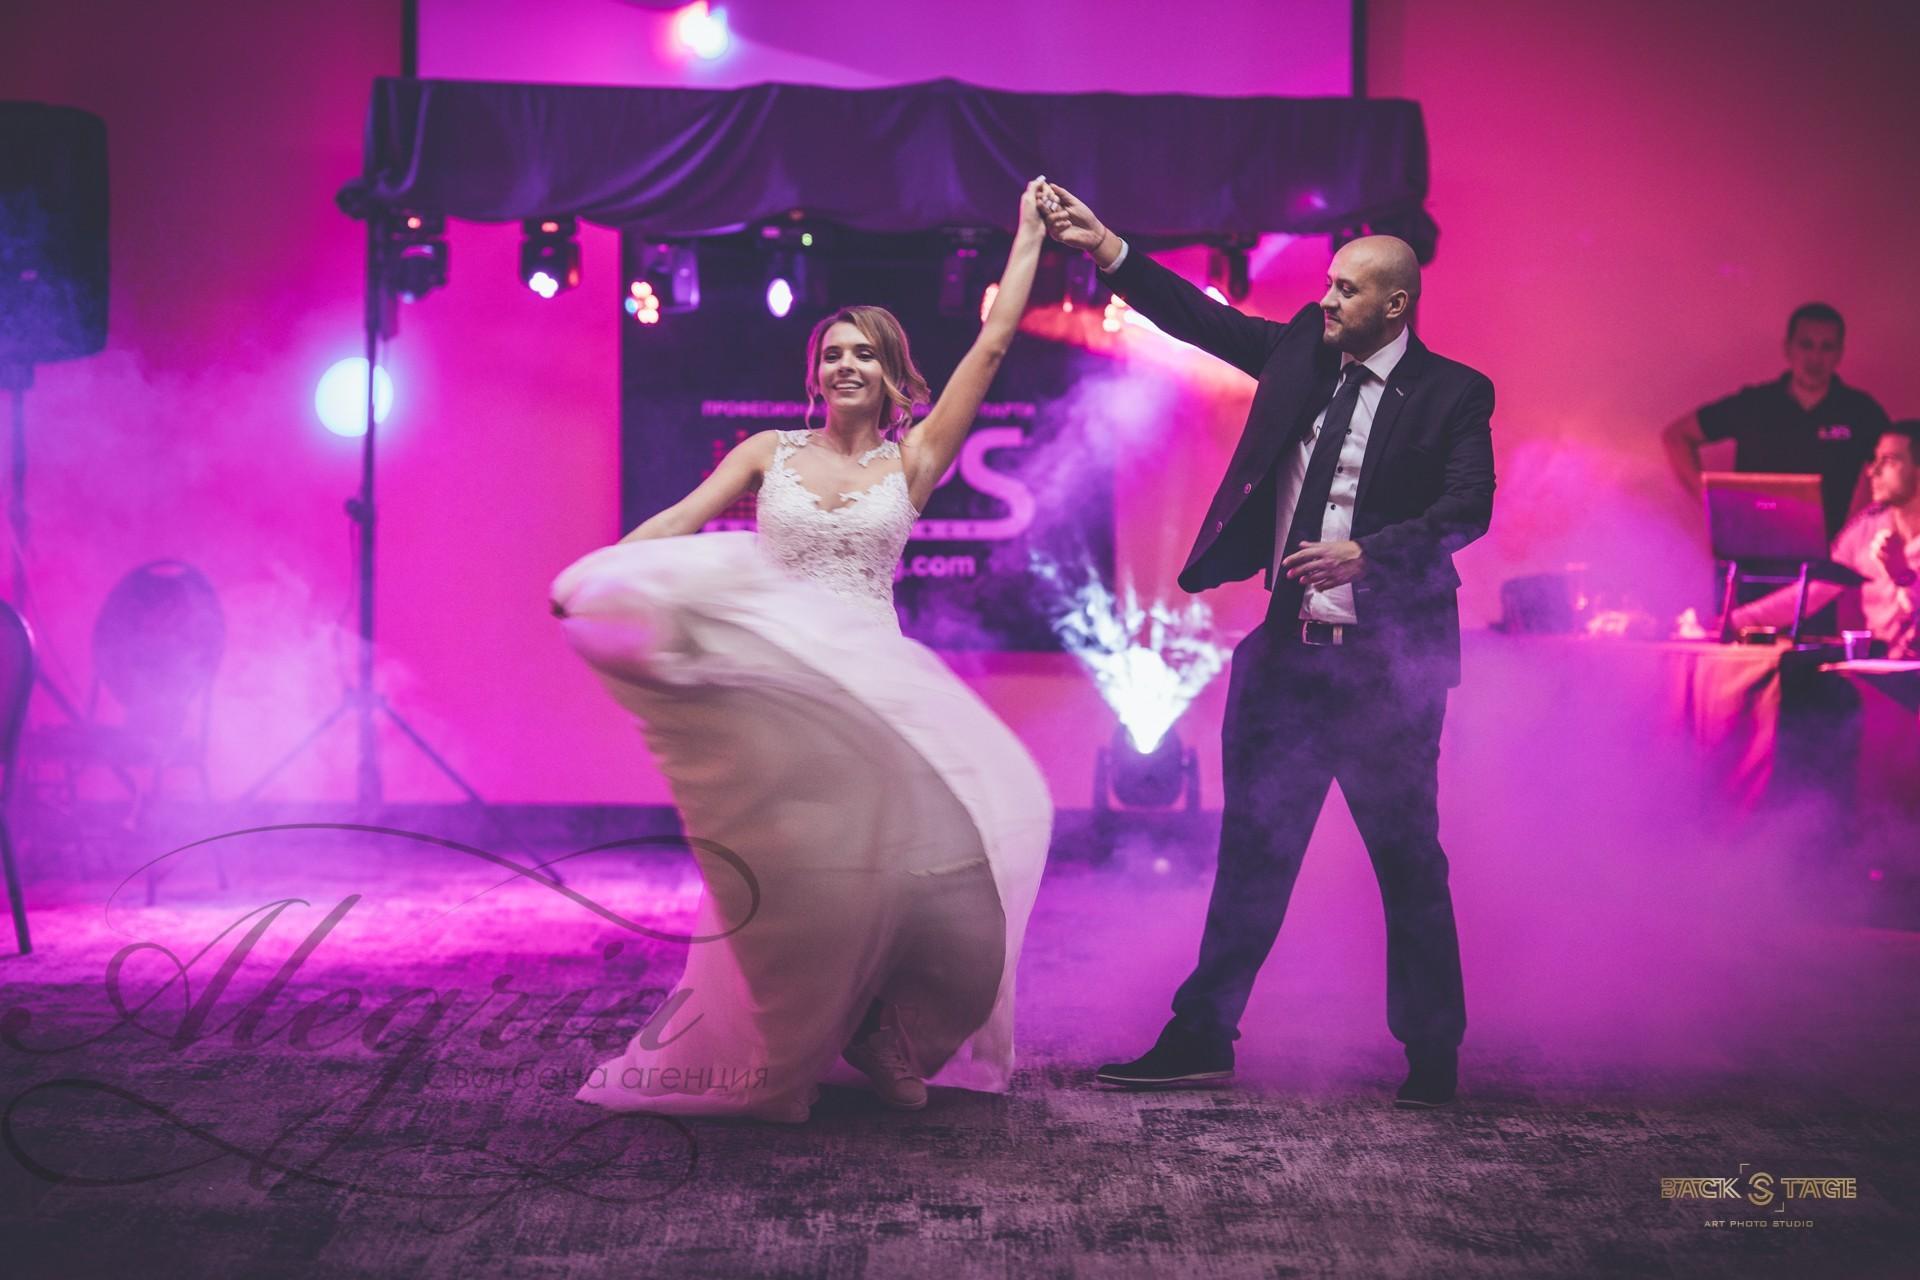 Видео - сватбена агенция Алегрия. Wedding agency Alegria